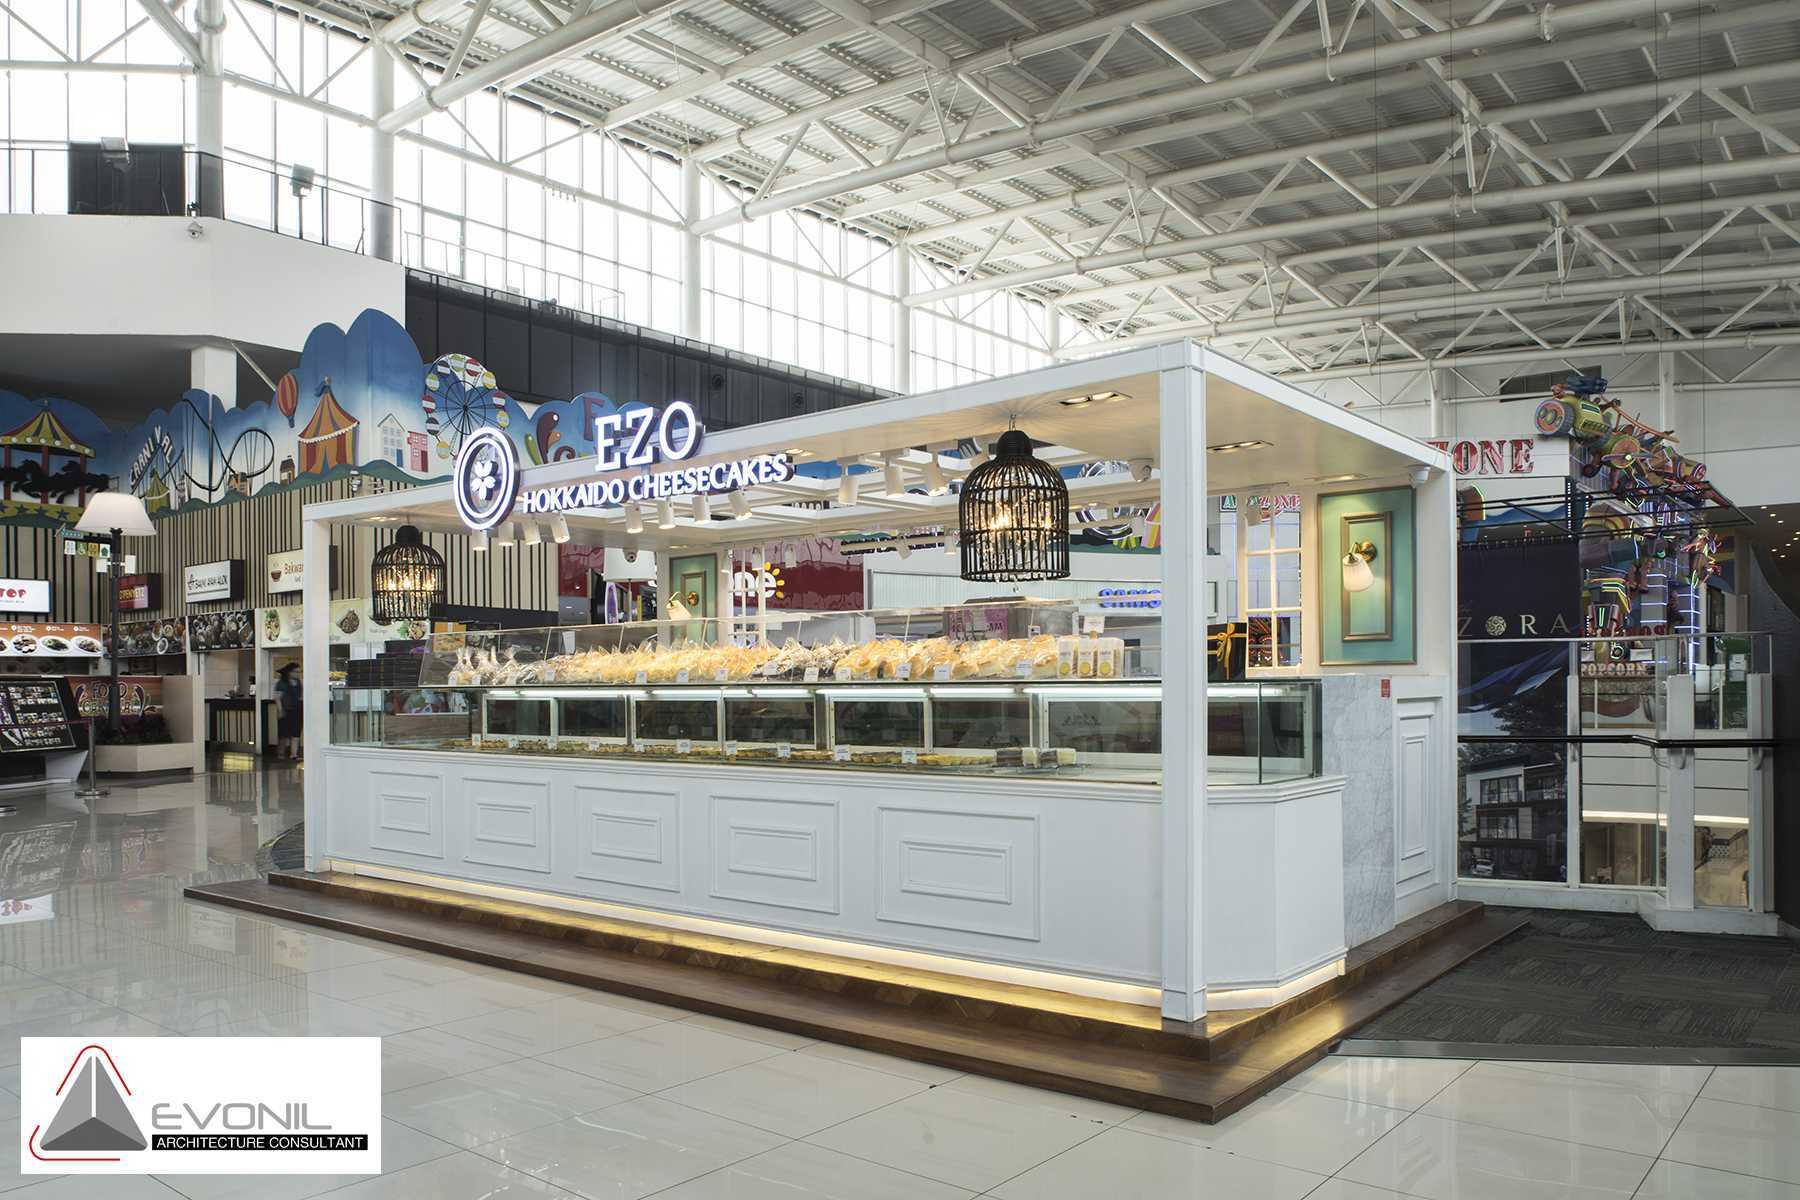 Evonil Architecture Ezo Cheesecakes Bakery - Mall Aeon Bsd Tangerang, Kota Tangerang, Banten, Indonesia Tangerang, Kota Tangerang, Banten, Indonesia Evonil-Architecture-Ezo-Cheesecakes-Bakery-Mall-Aeon-Bsd  59572